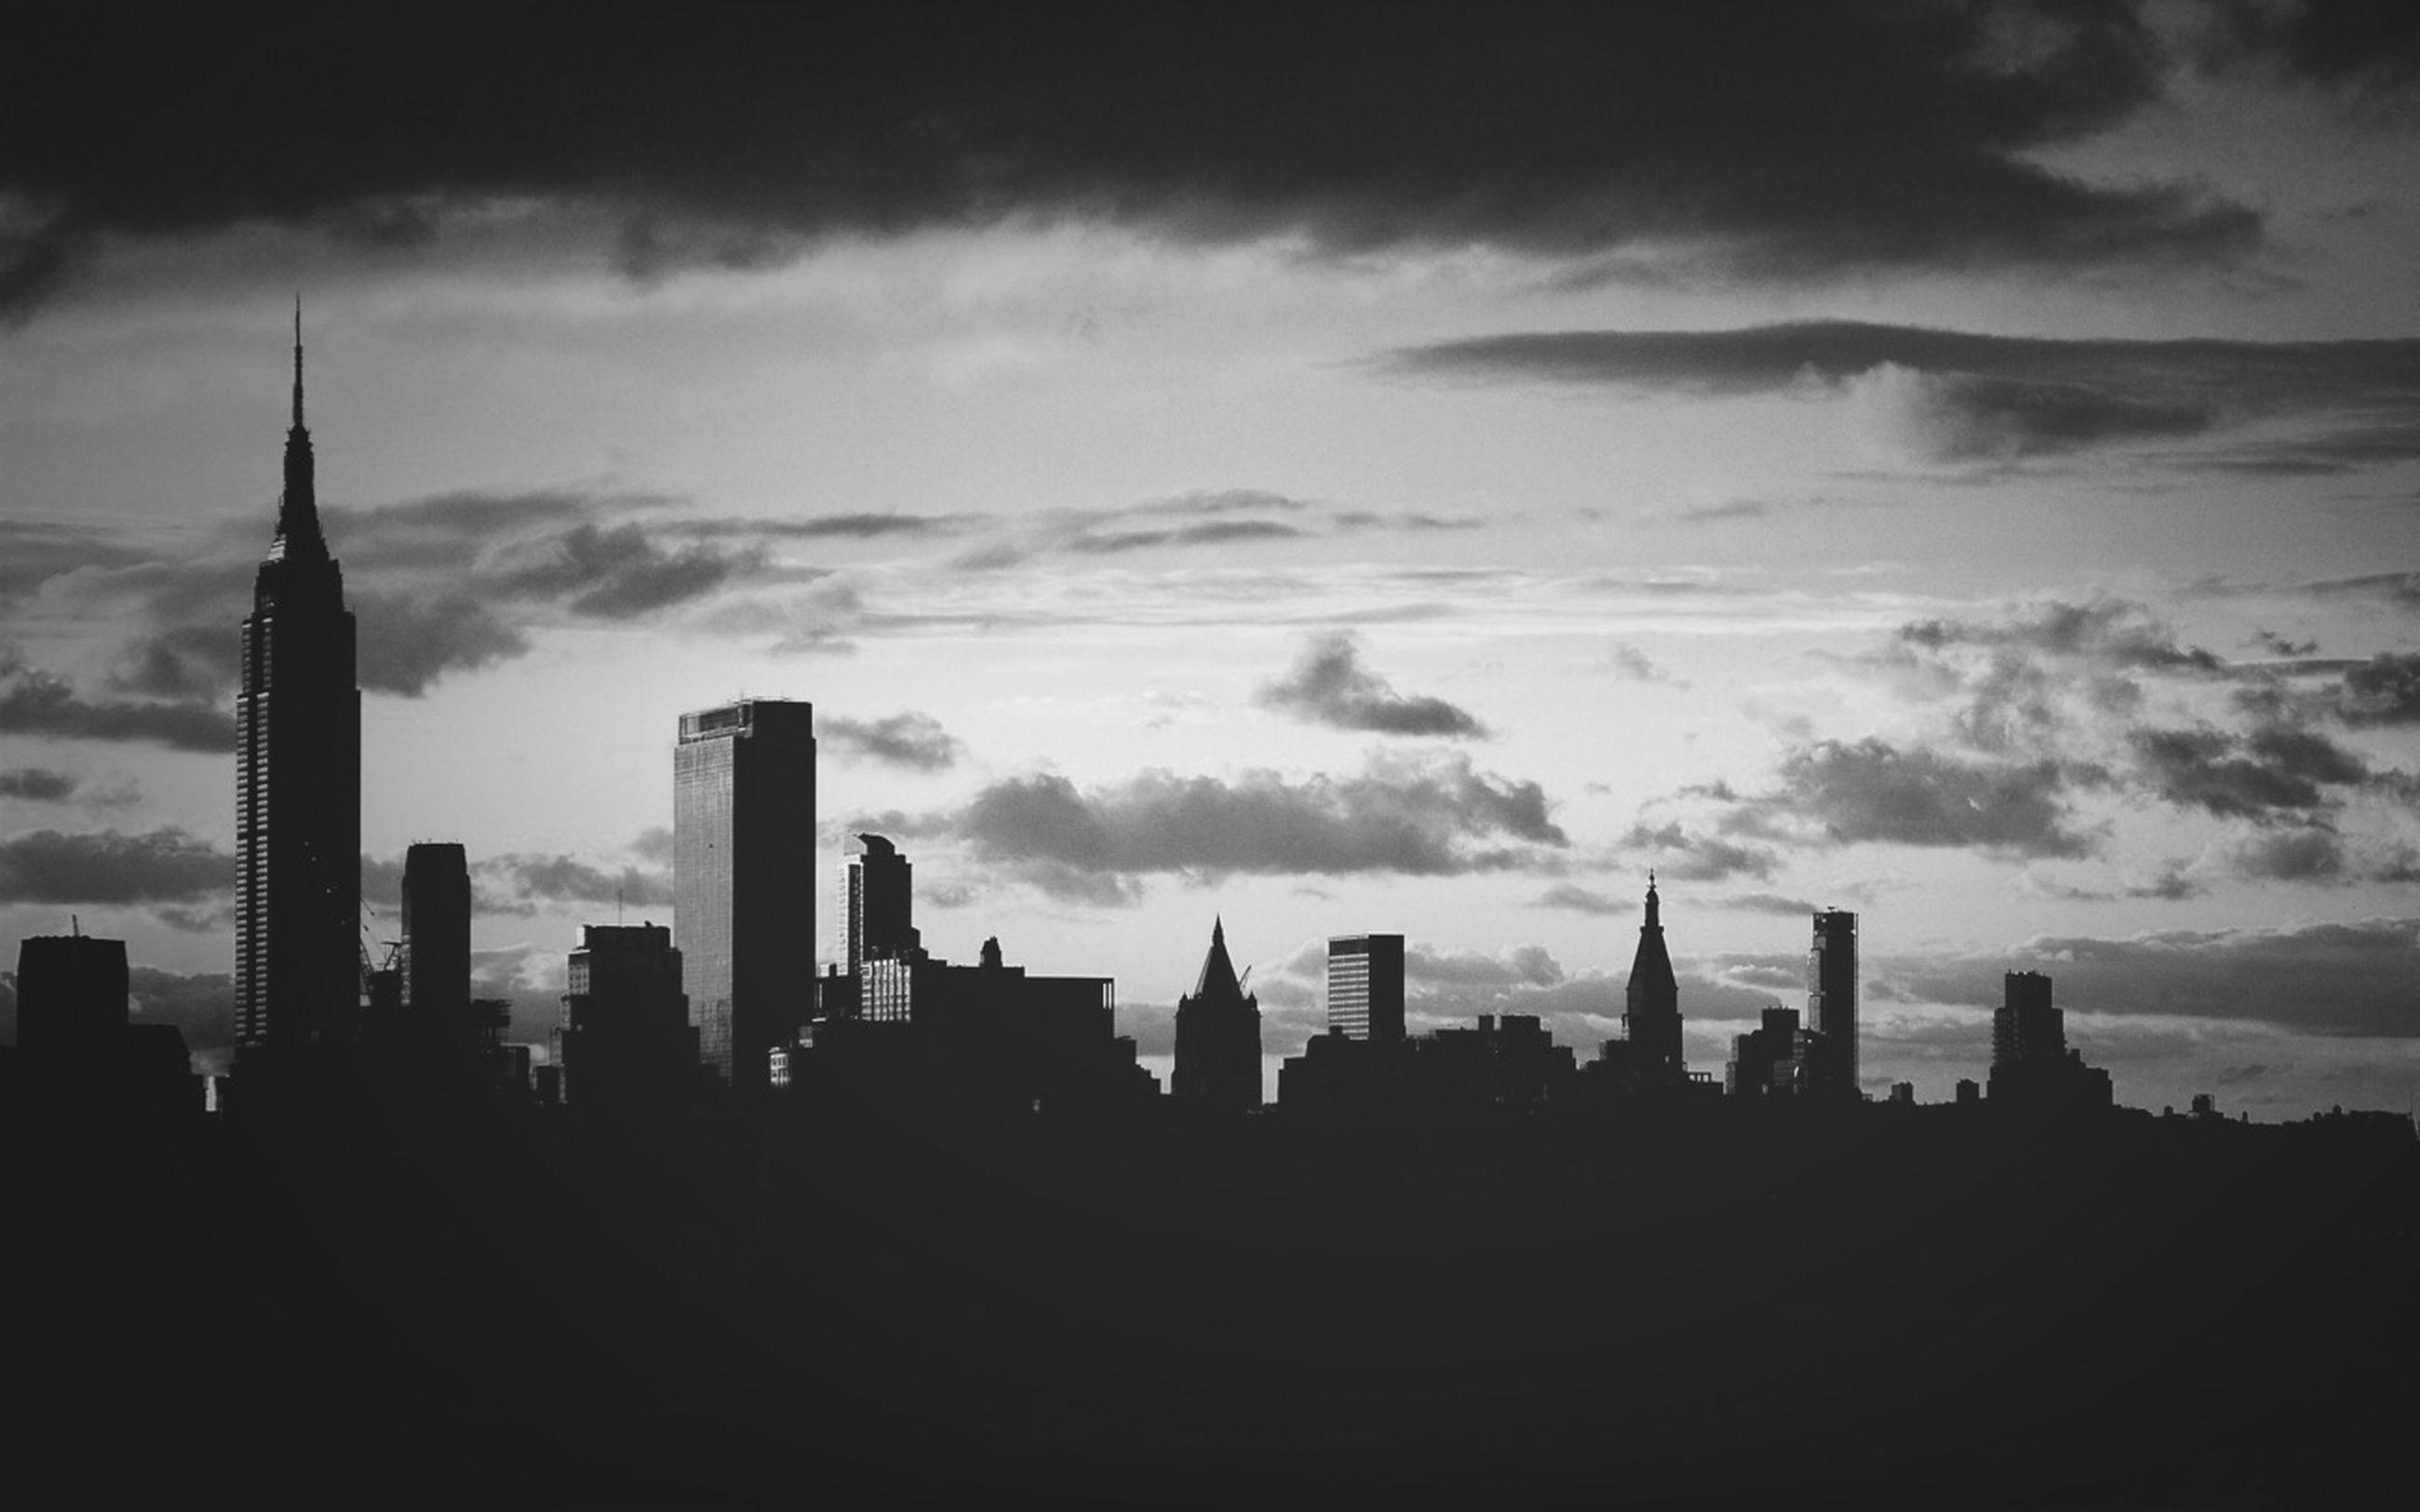 building exterior, architecture, built structure, sky, silhouette, city, skyscraper, cloud - sky, tall - high, tower, cityscape, urban skyline, cloudy, modern, office building, cloud, travel destinations, dusk, outdoors, skyline